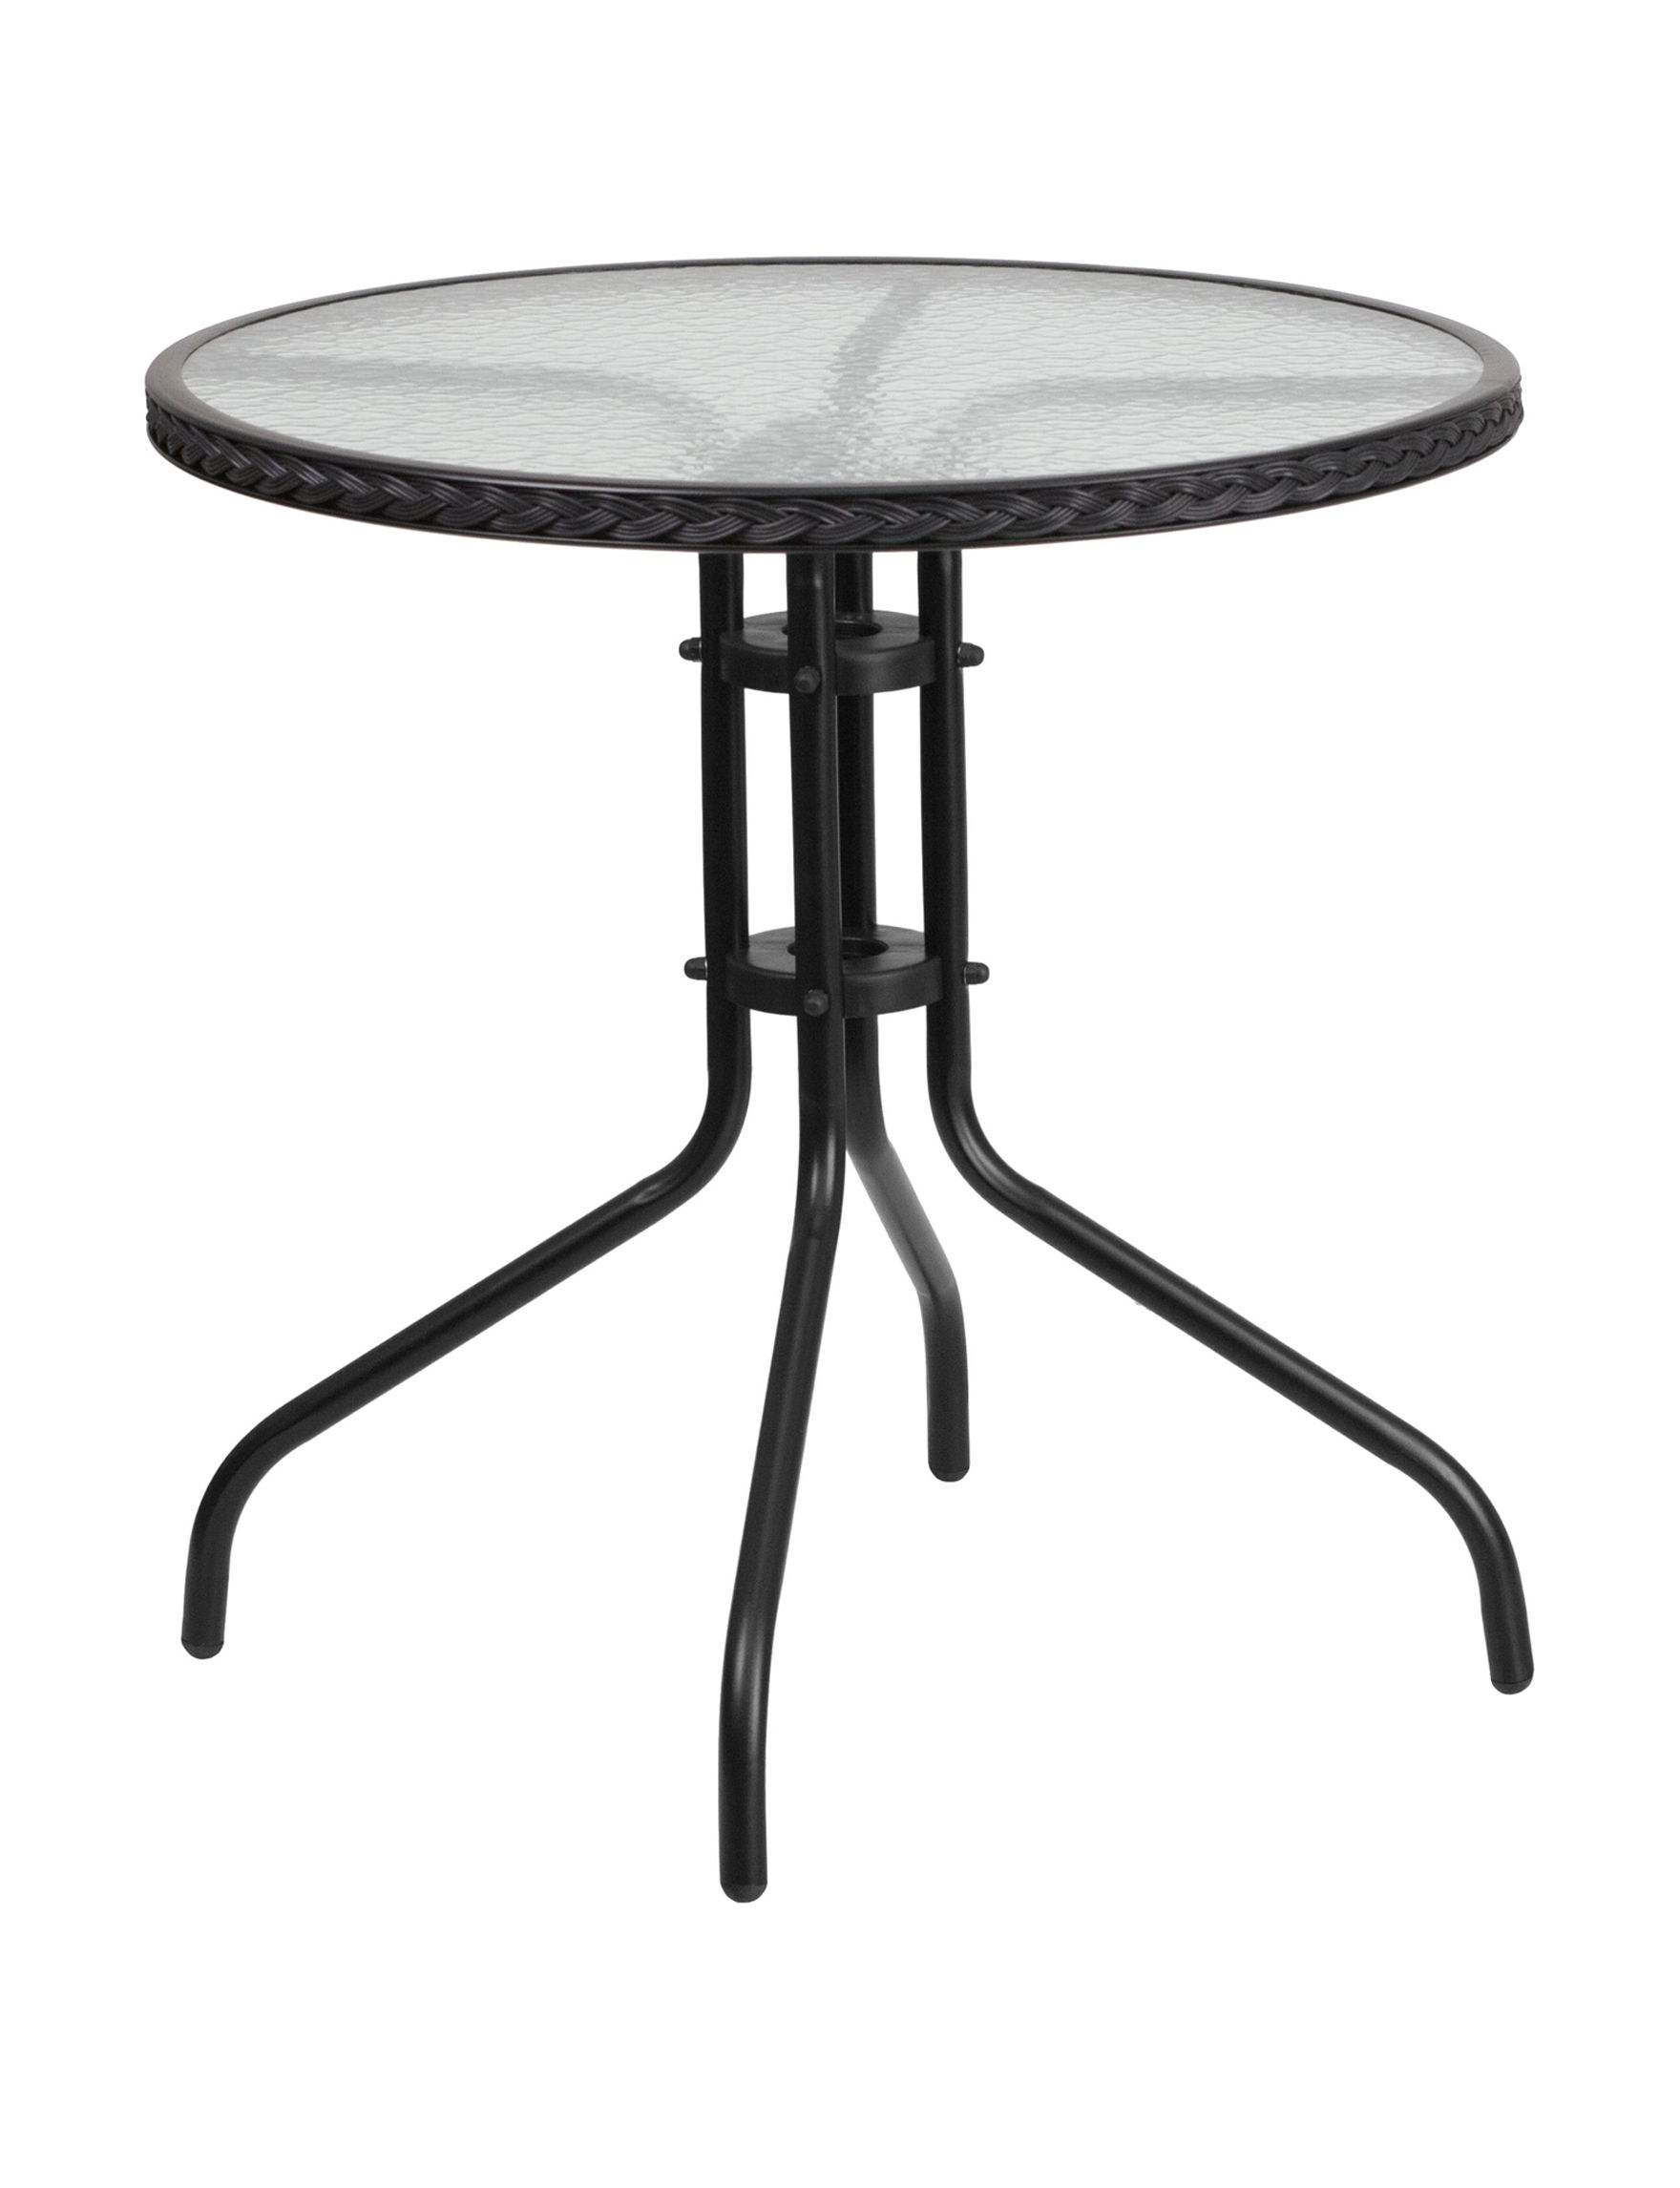 Flash Furniture Black Dining Tables Kitchen & Dining Furniture Patio & Outdoor Furniture